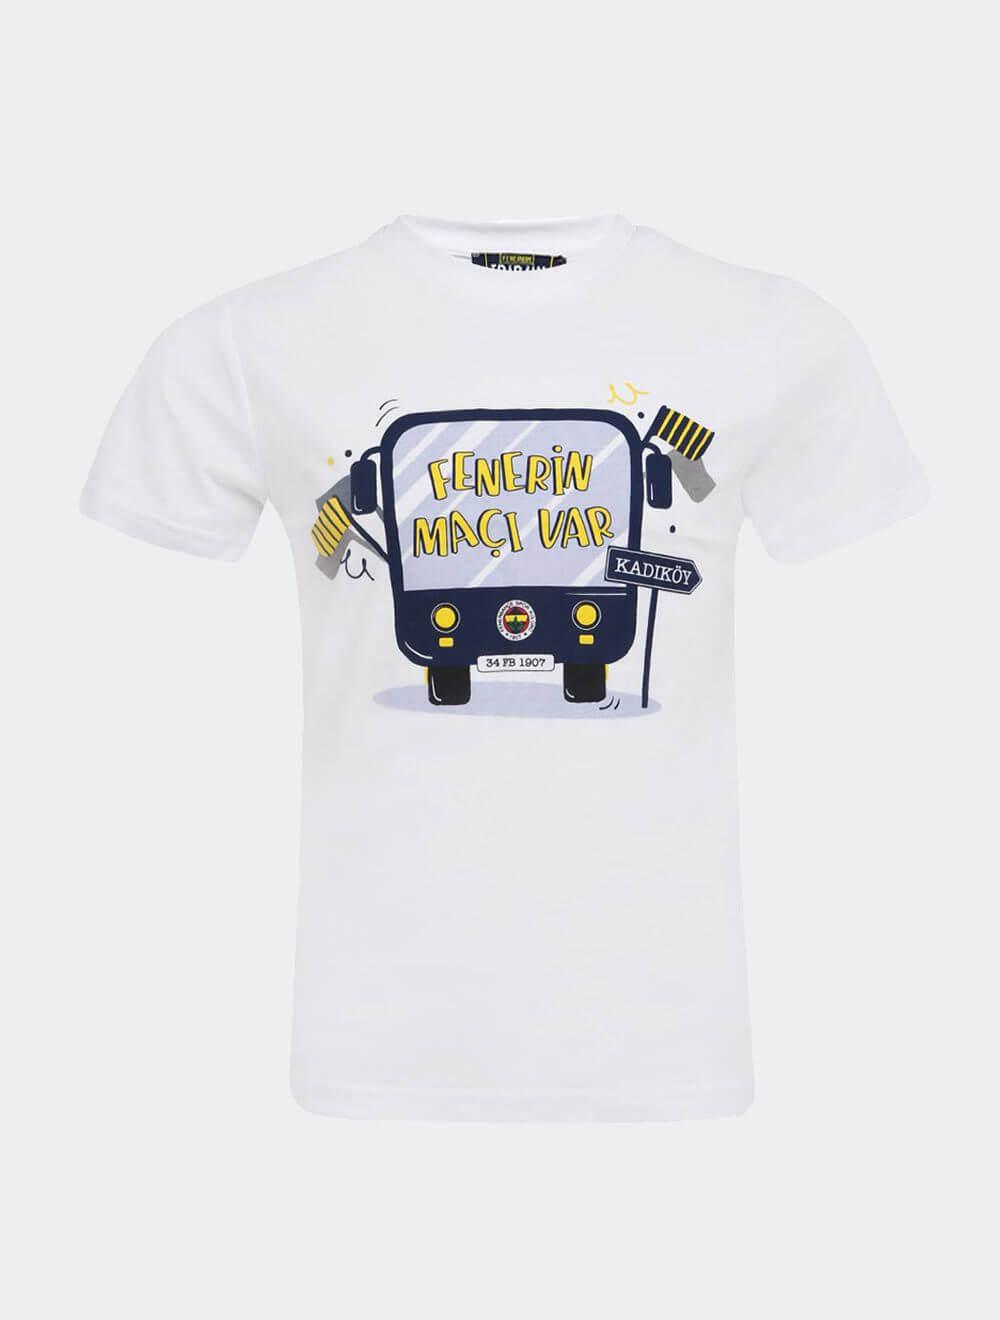 Çocuk Beyaz Tribün Maç Var T-Shirt